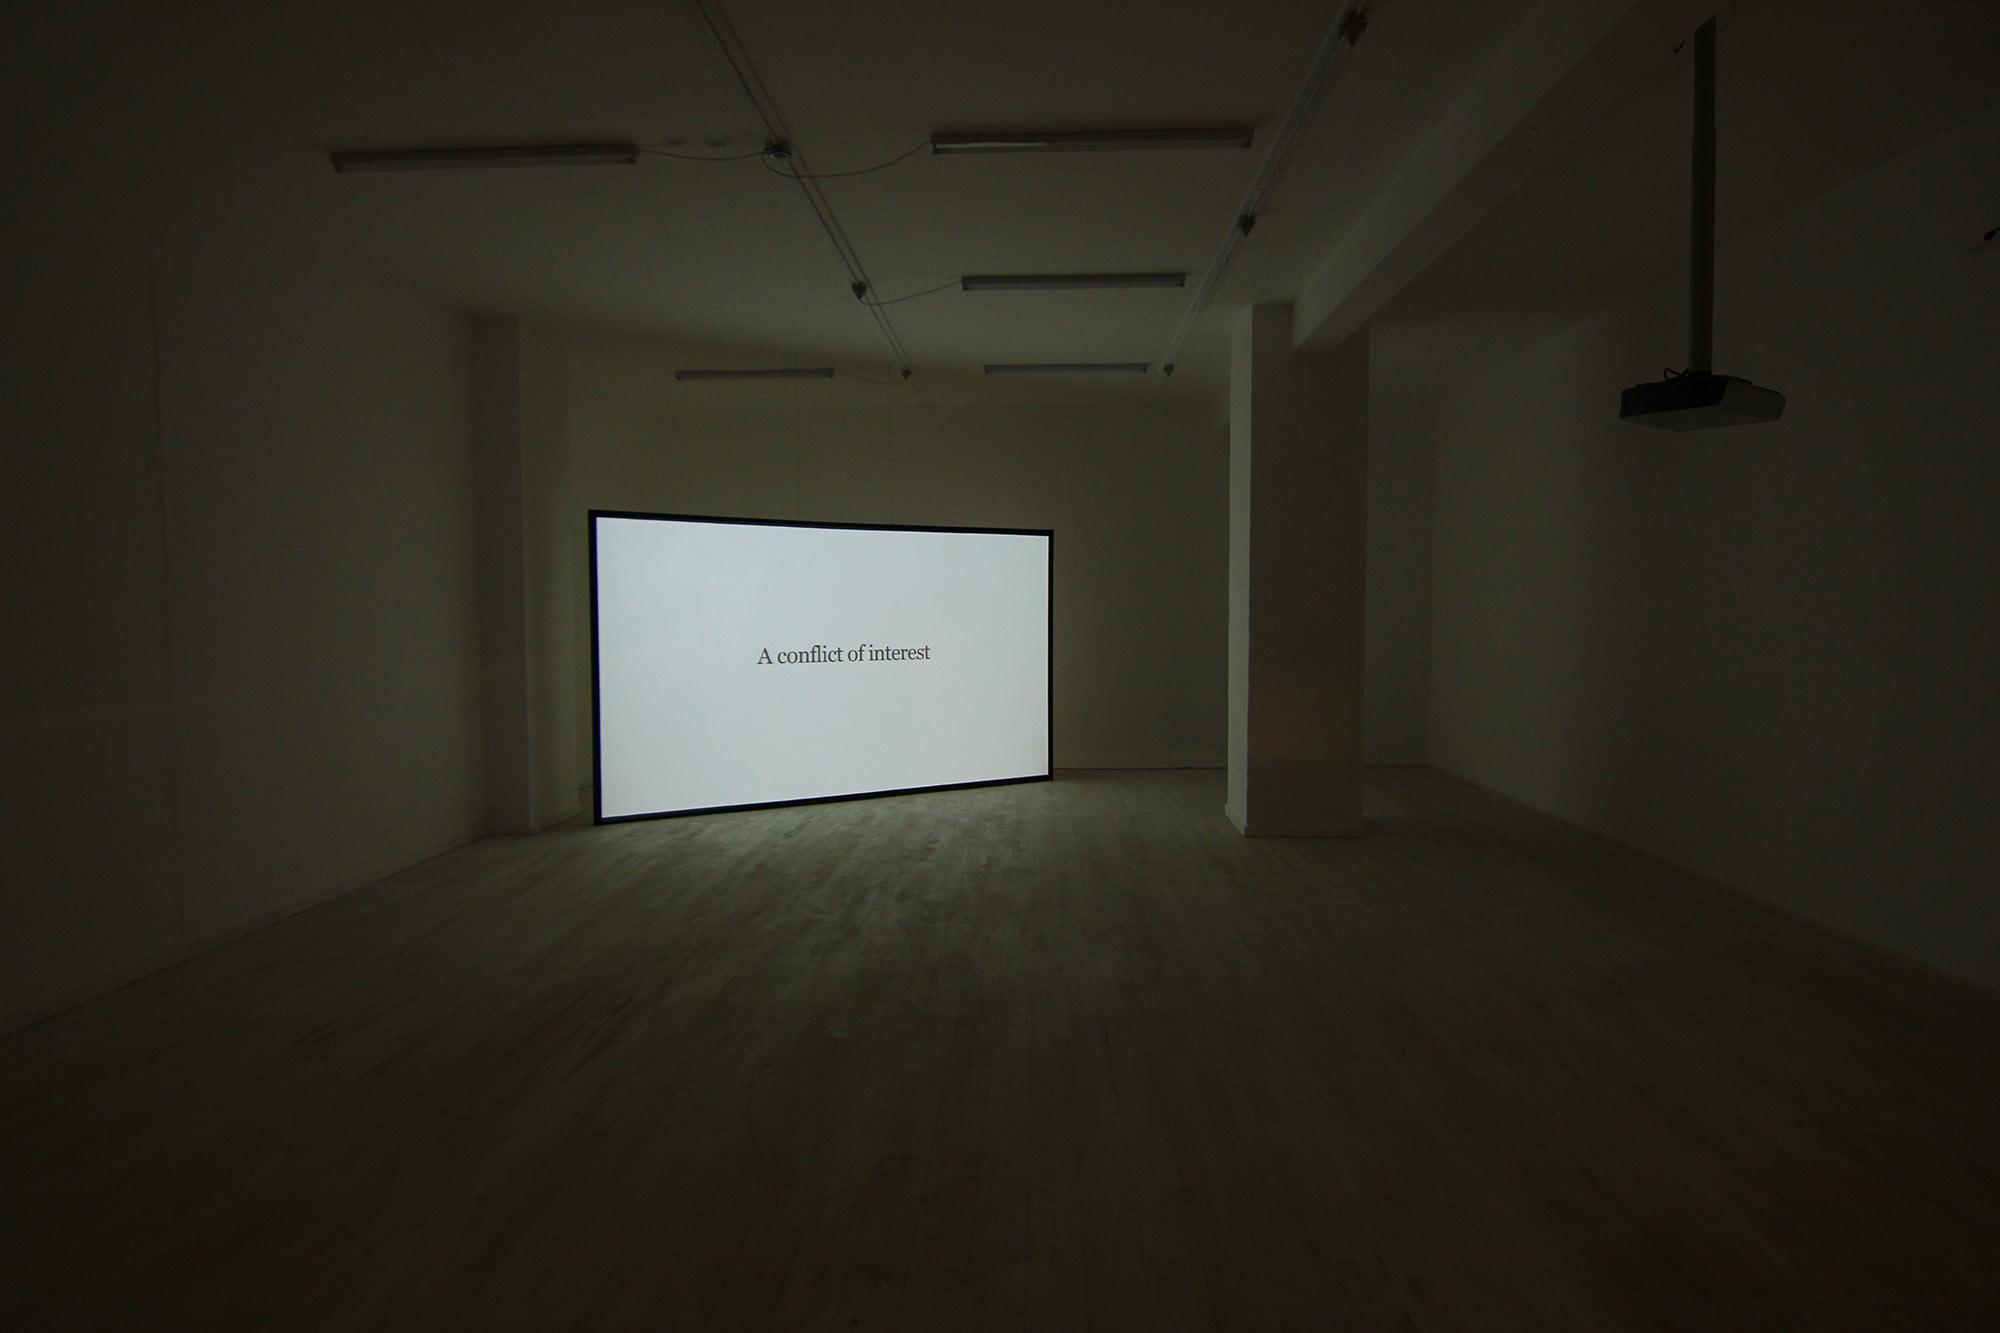 Installation view: Officin, 2014